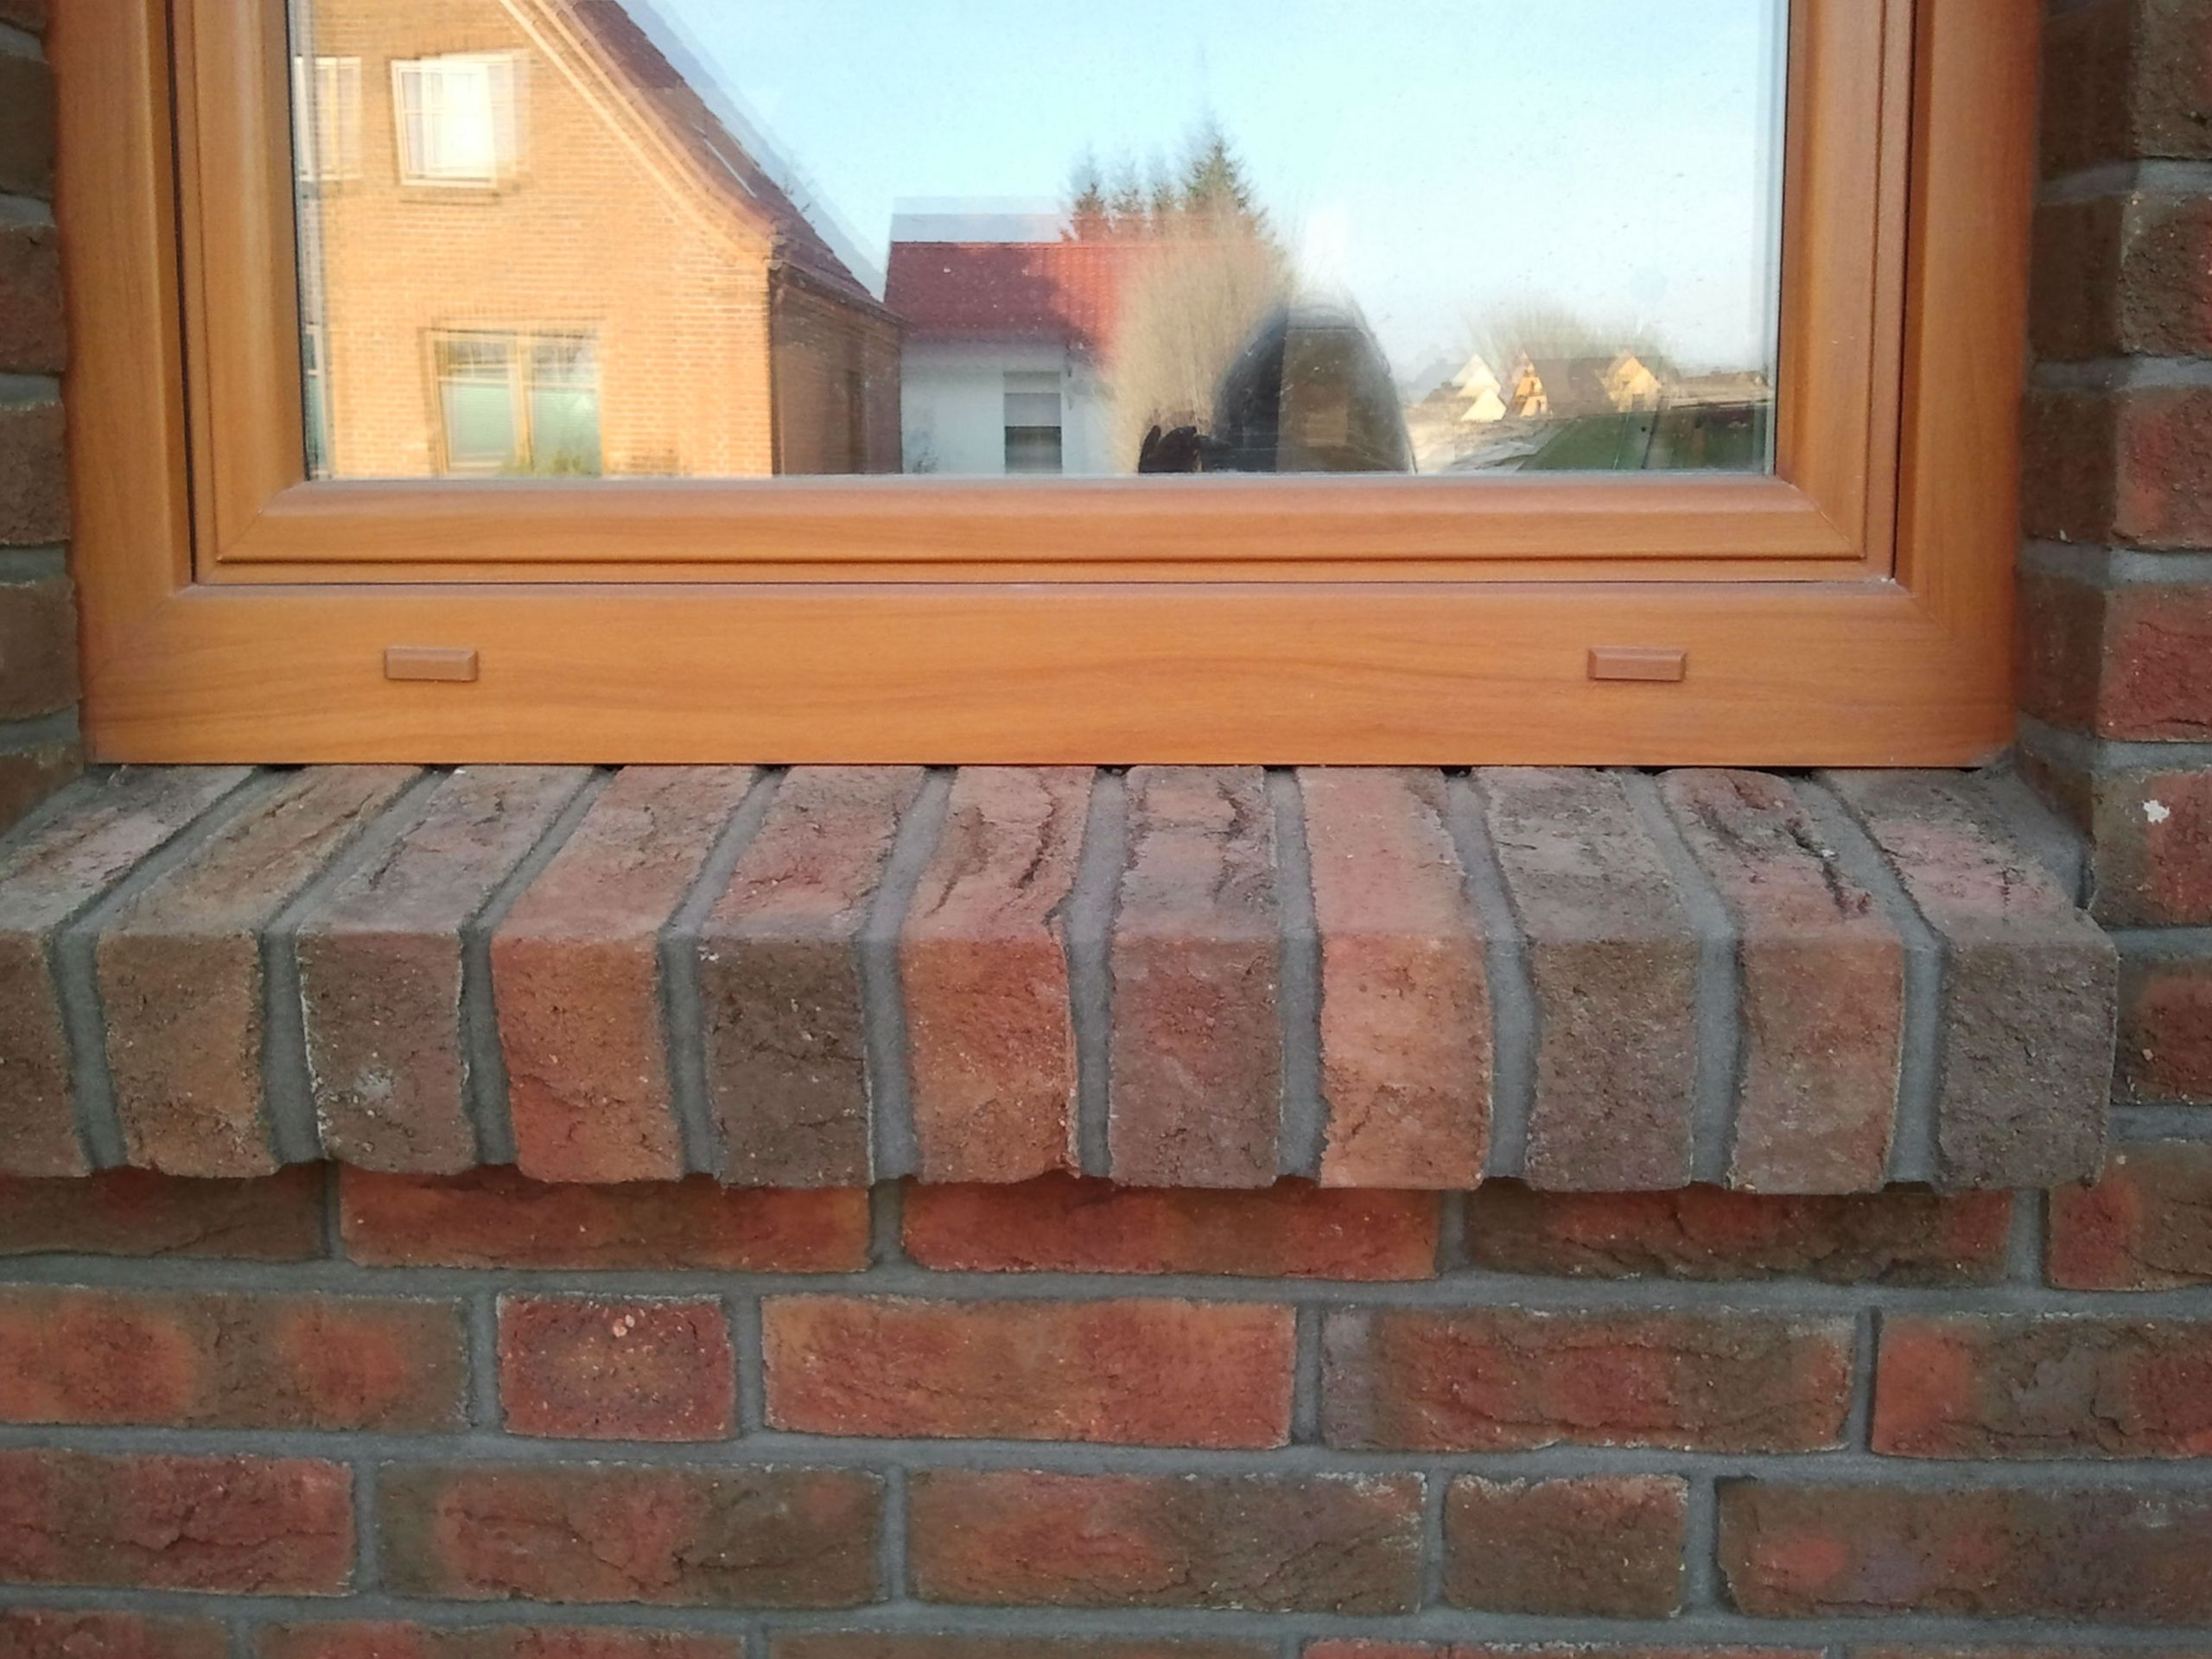 Fensterbank als Rollschicht | Fassade | Pinterest | Fensterbänke ...